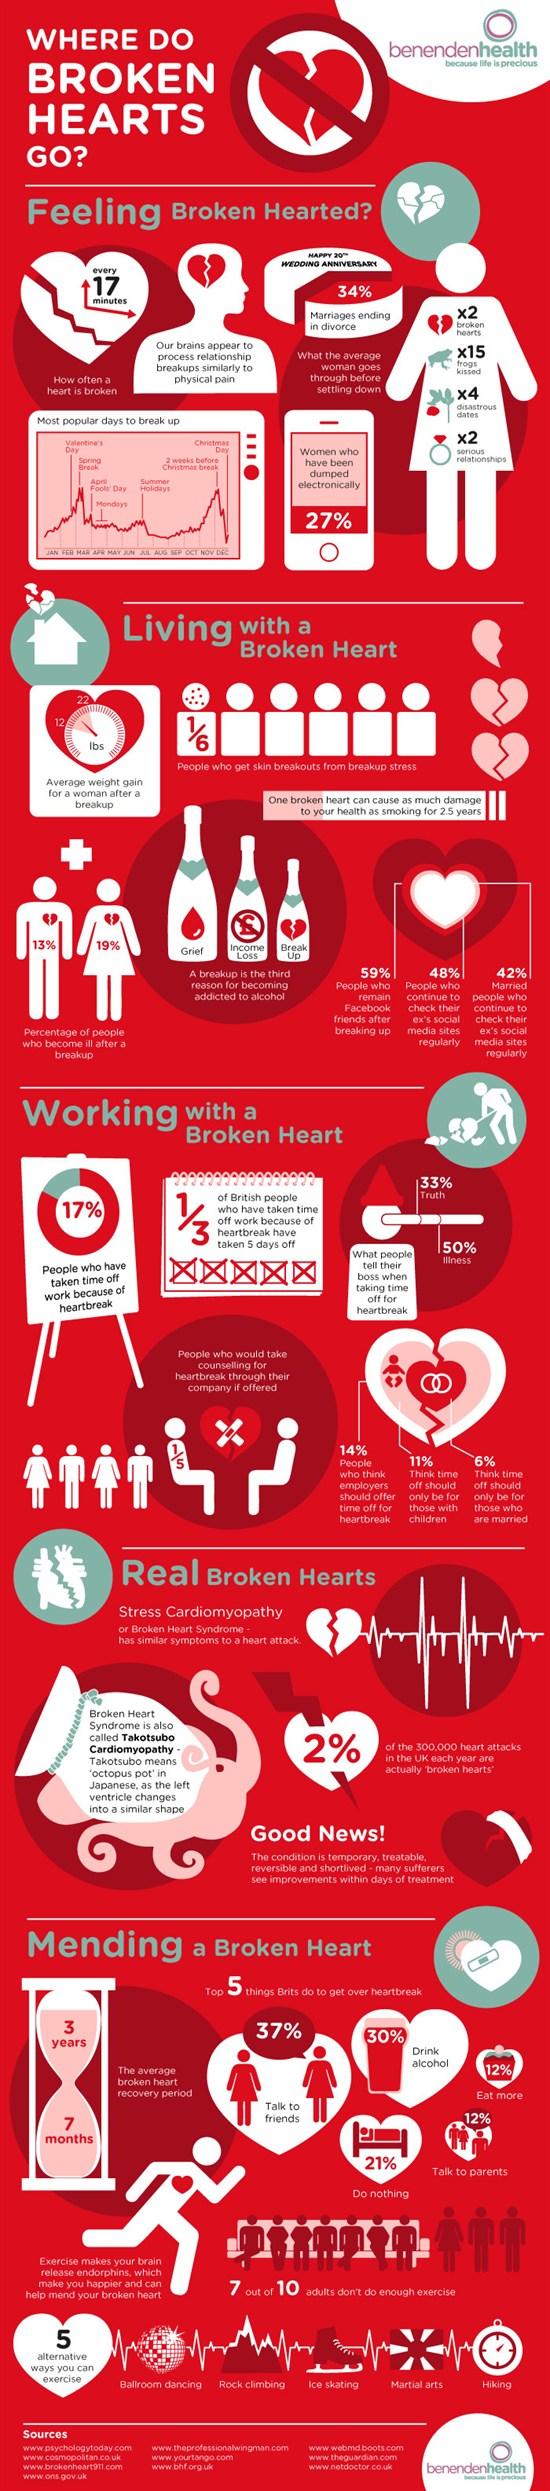 Where-do-broken-hearts-go-info-graphic_550x2491